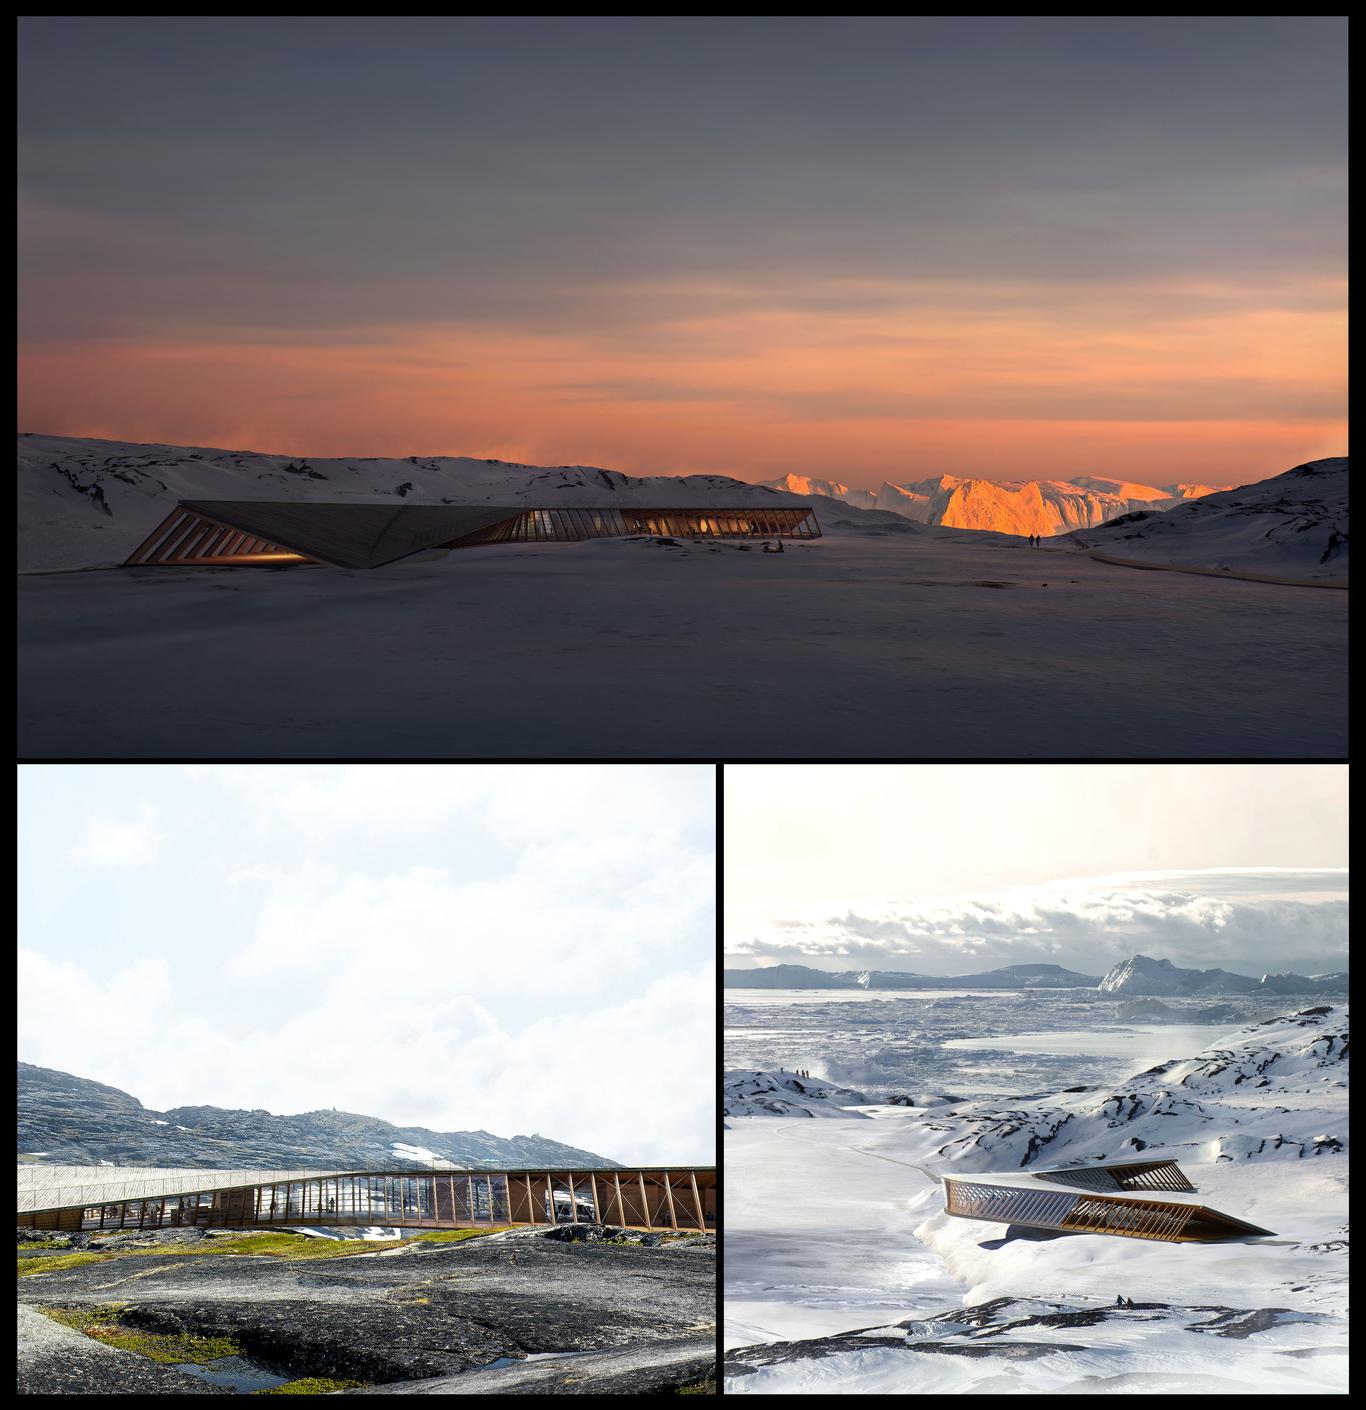 M3dve icefjord 1 88b1a034 v5b6